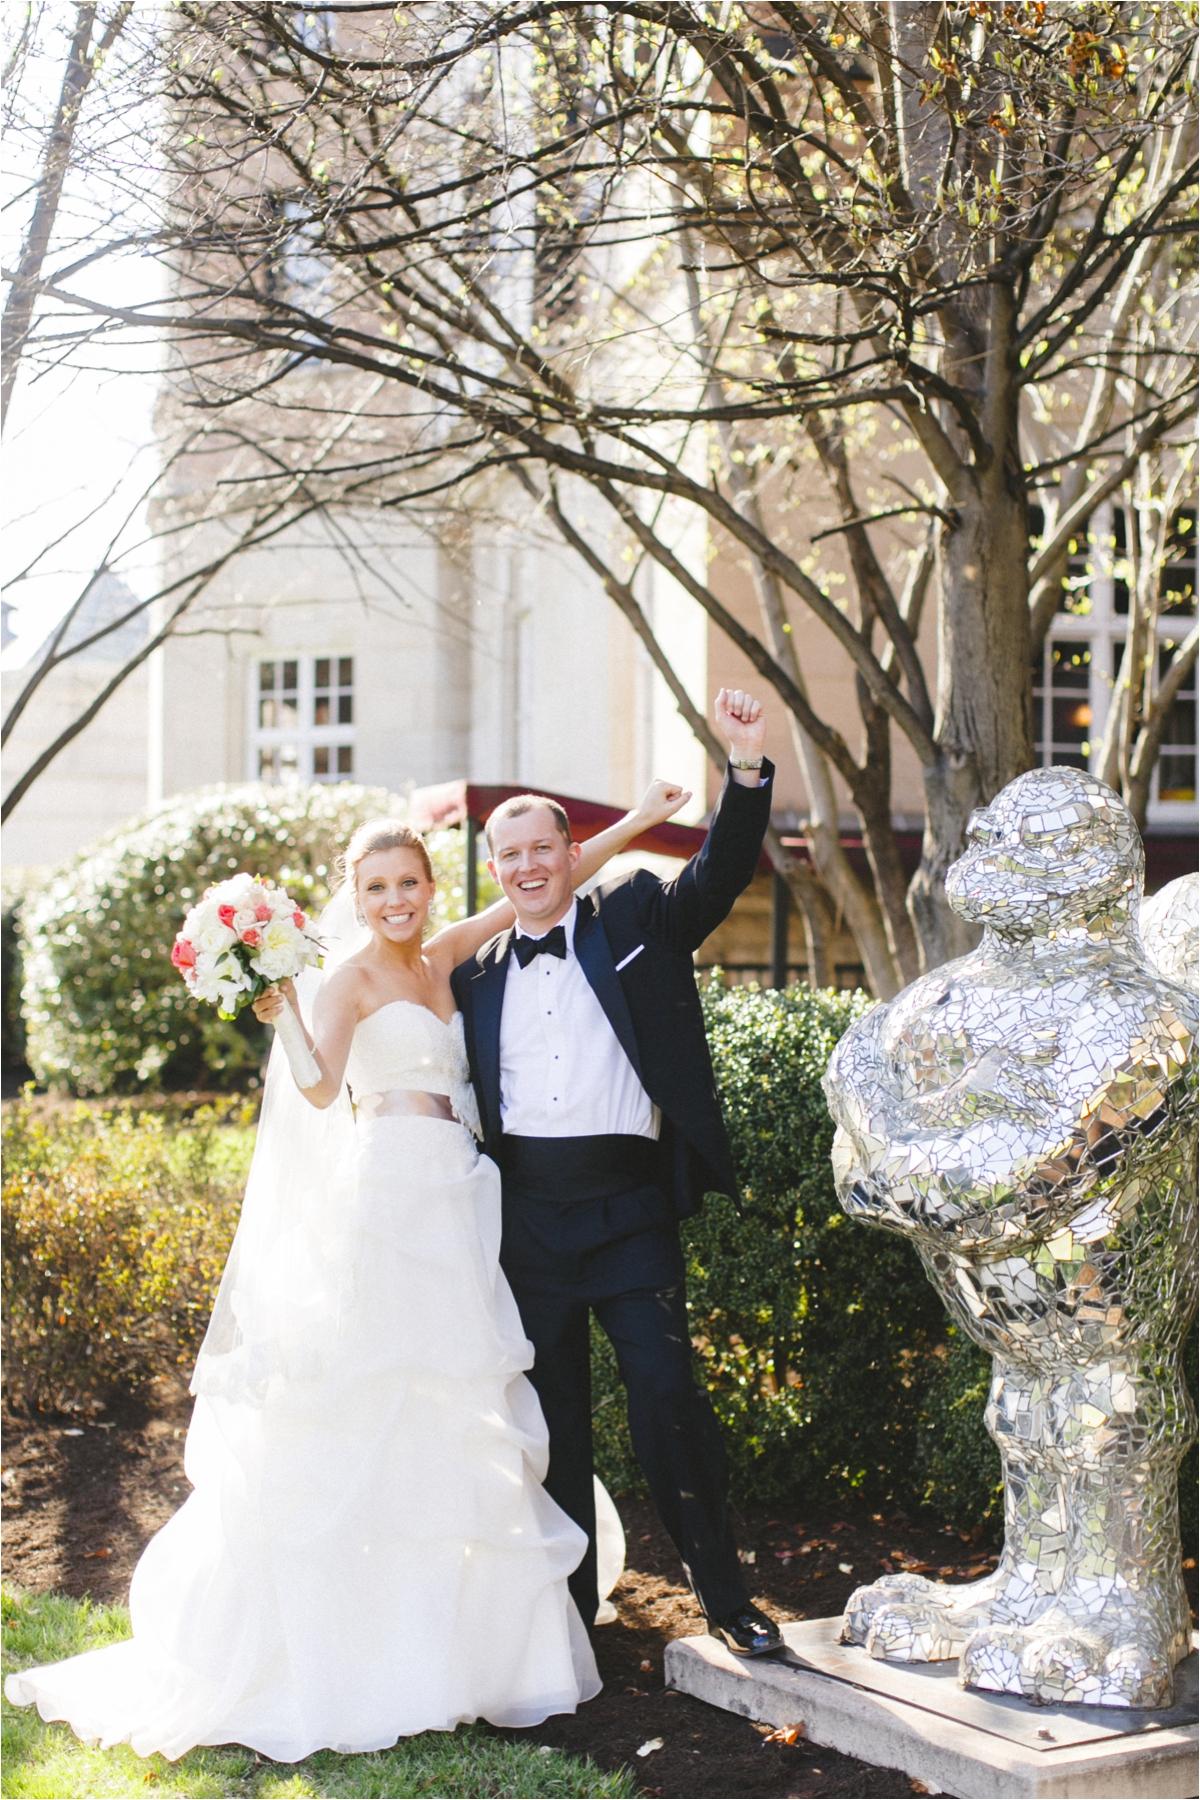 jaclyn-ryan-classic-hotel-roanoke-virginia-wedding-_0054